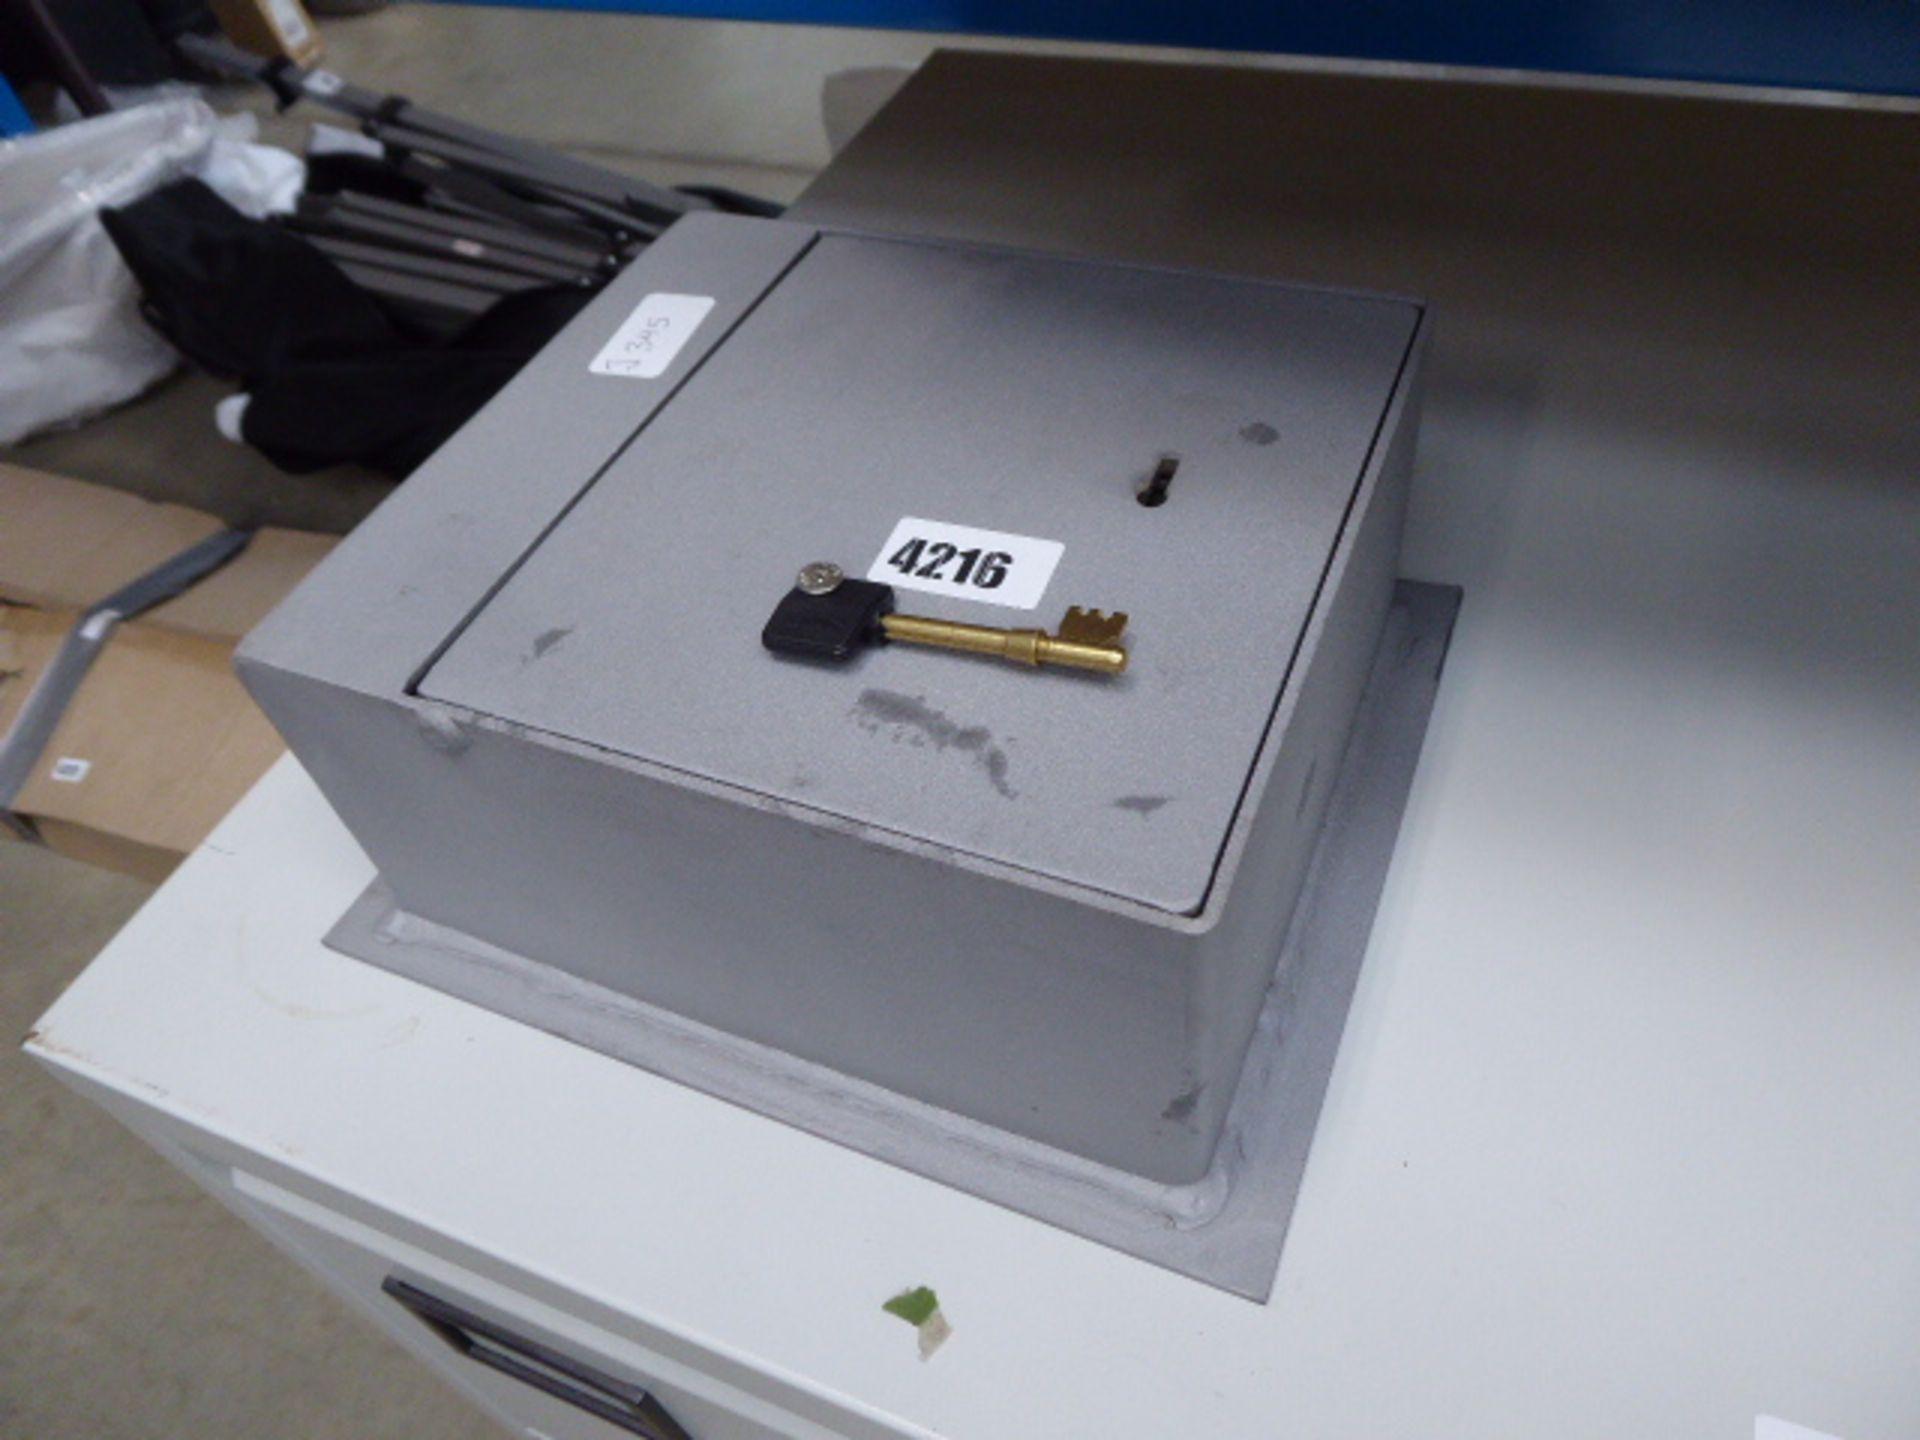 Lot 4216 - Small wall/floor key safe